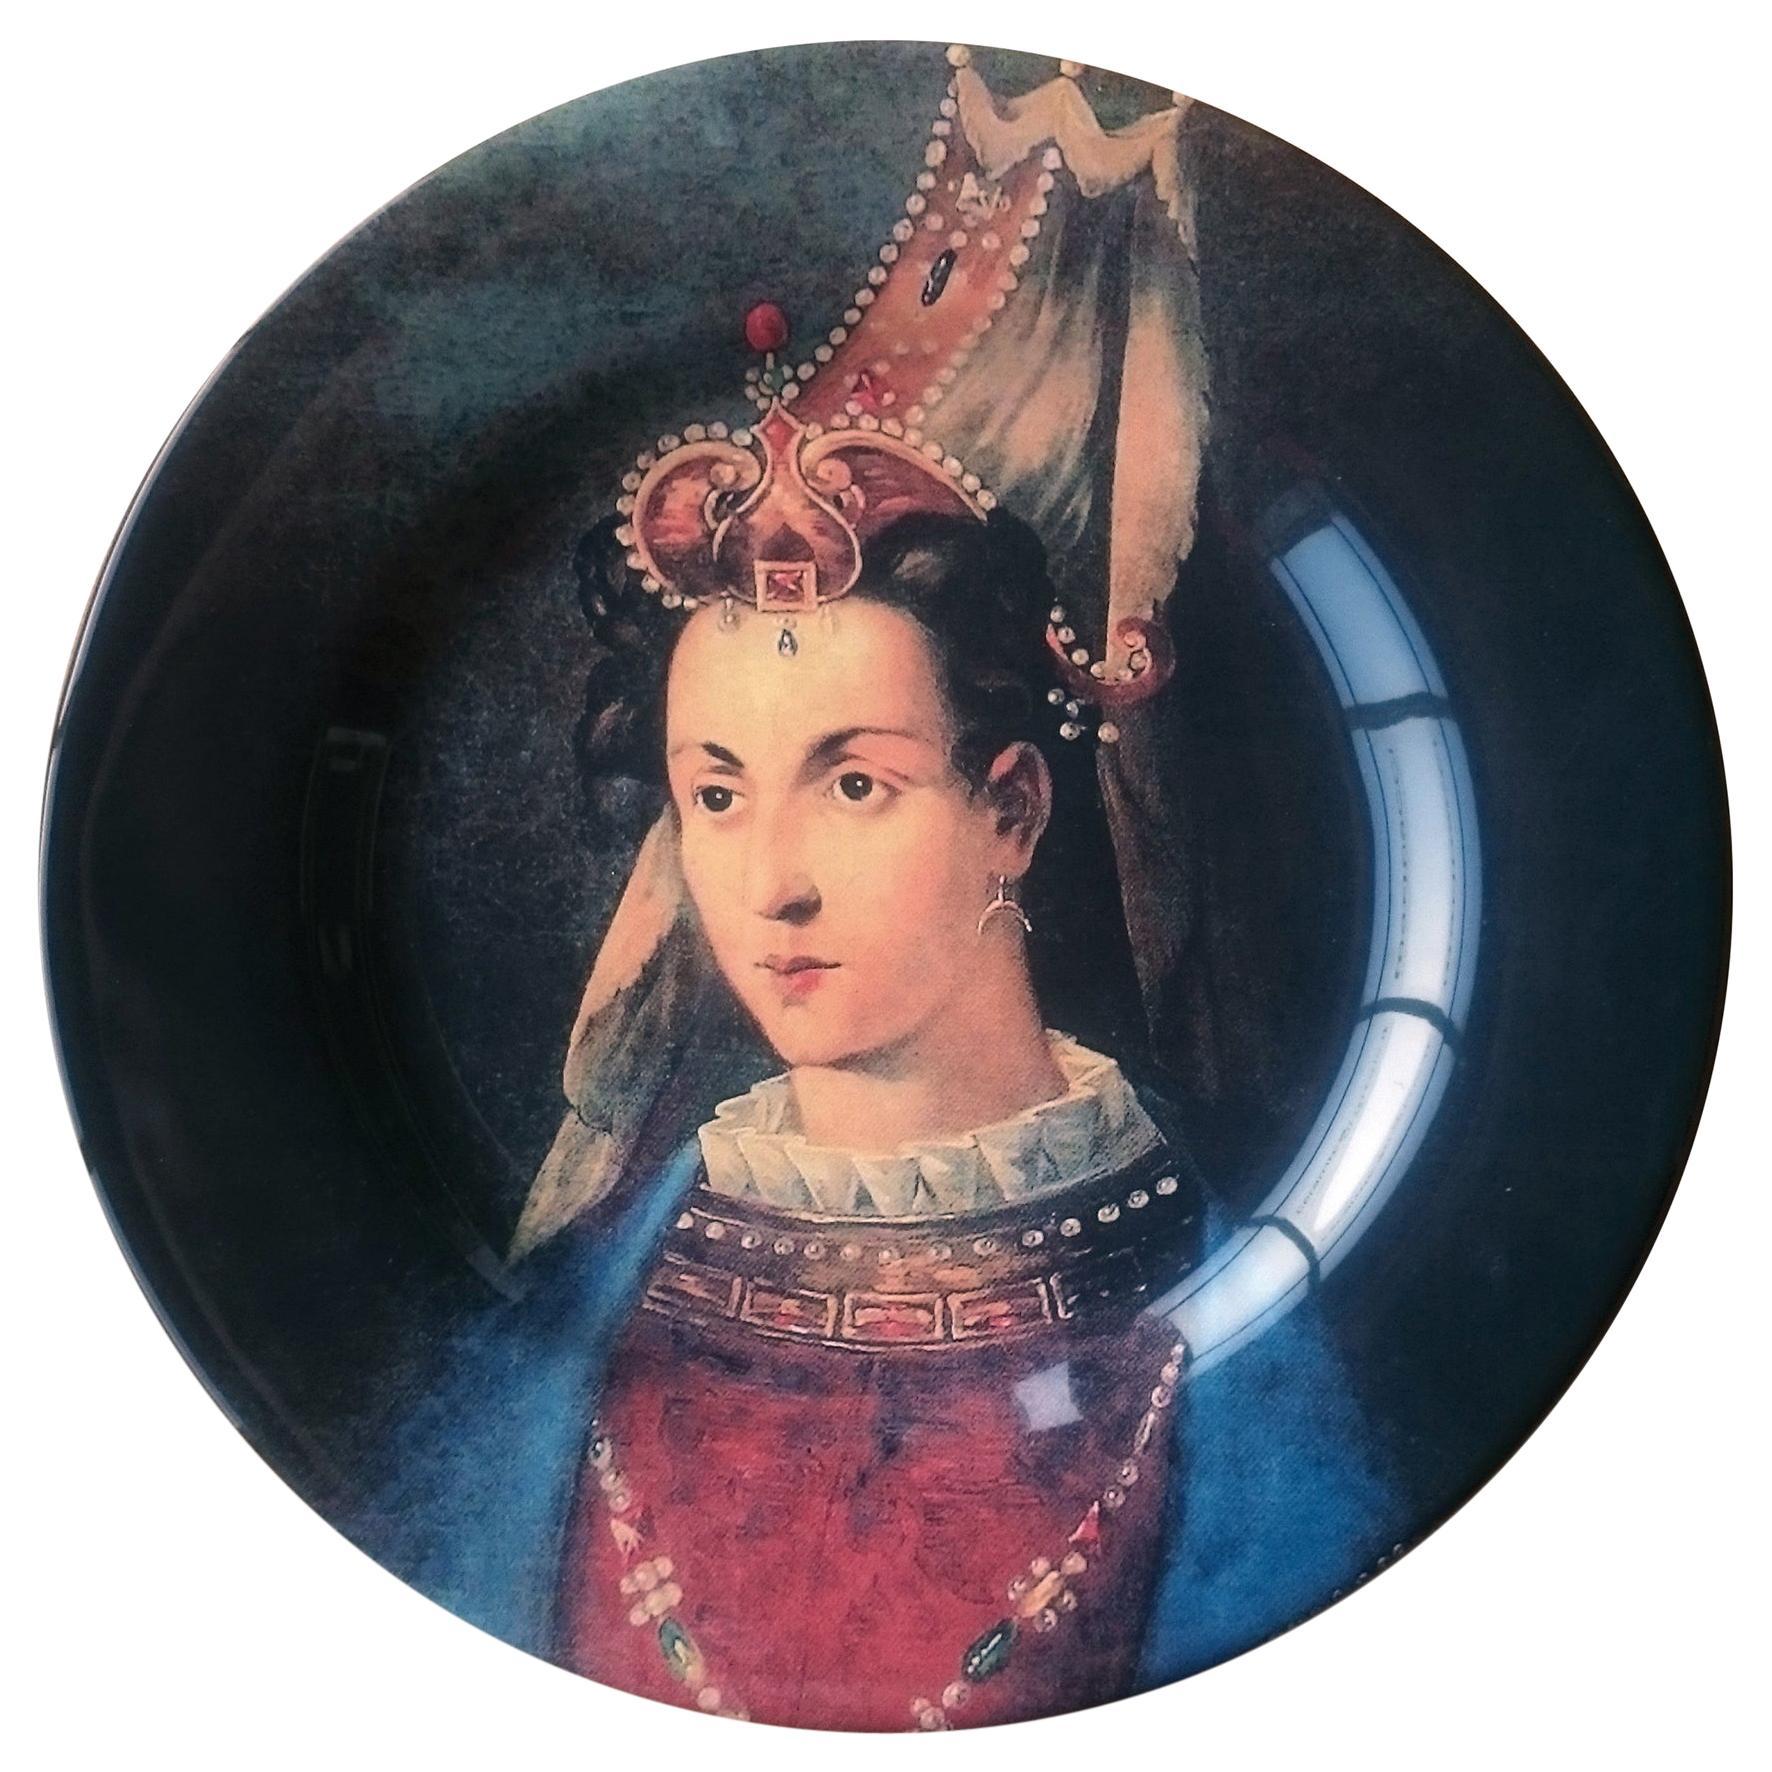 Handmade Ottoman Woman Portrait Ceramic Dinner Plate